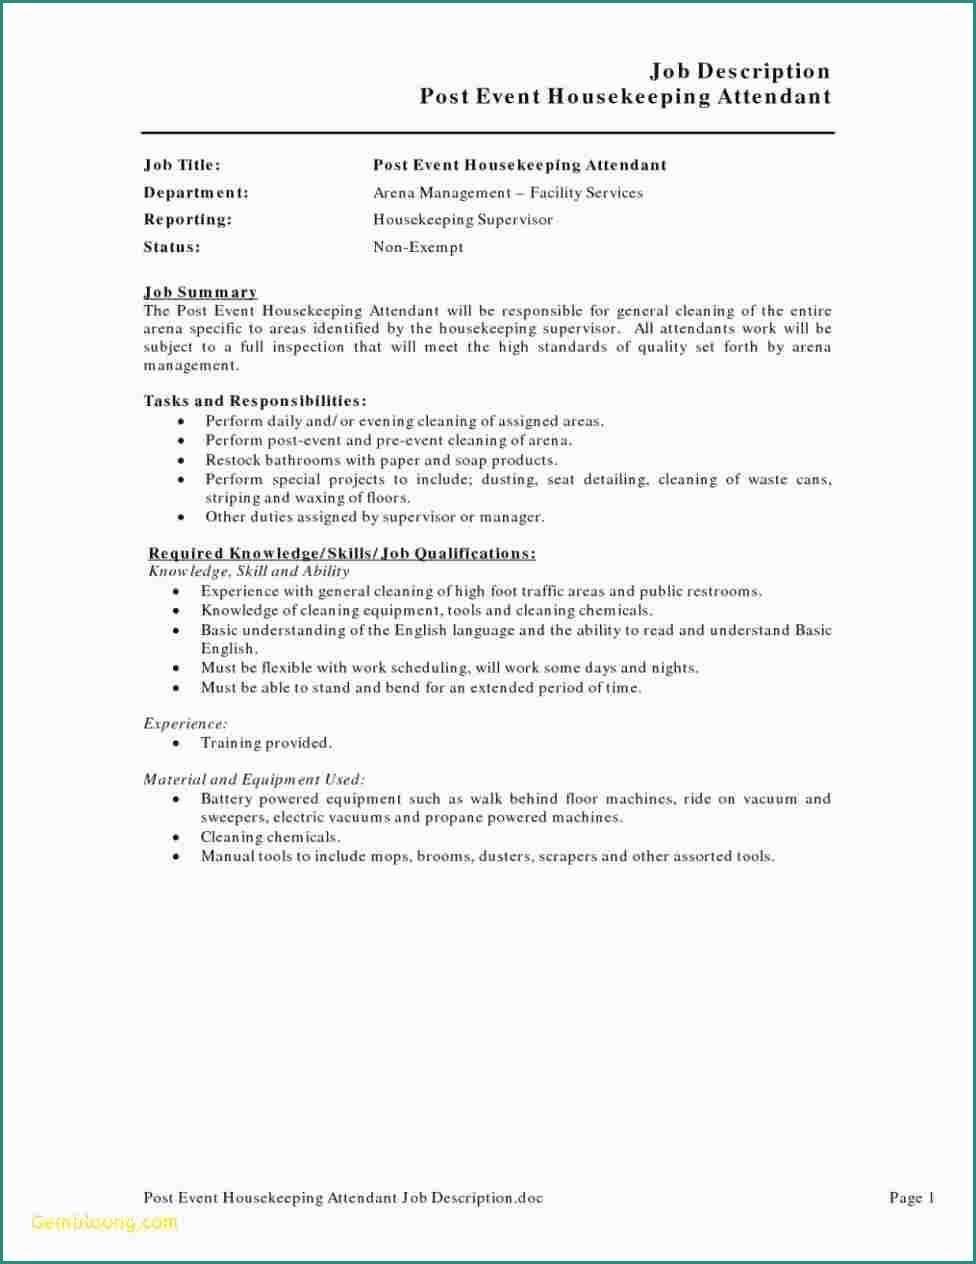 Duties Application Letter Of Housekeeping Supervisor | www.tollebild.com